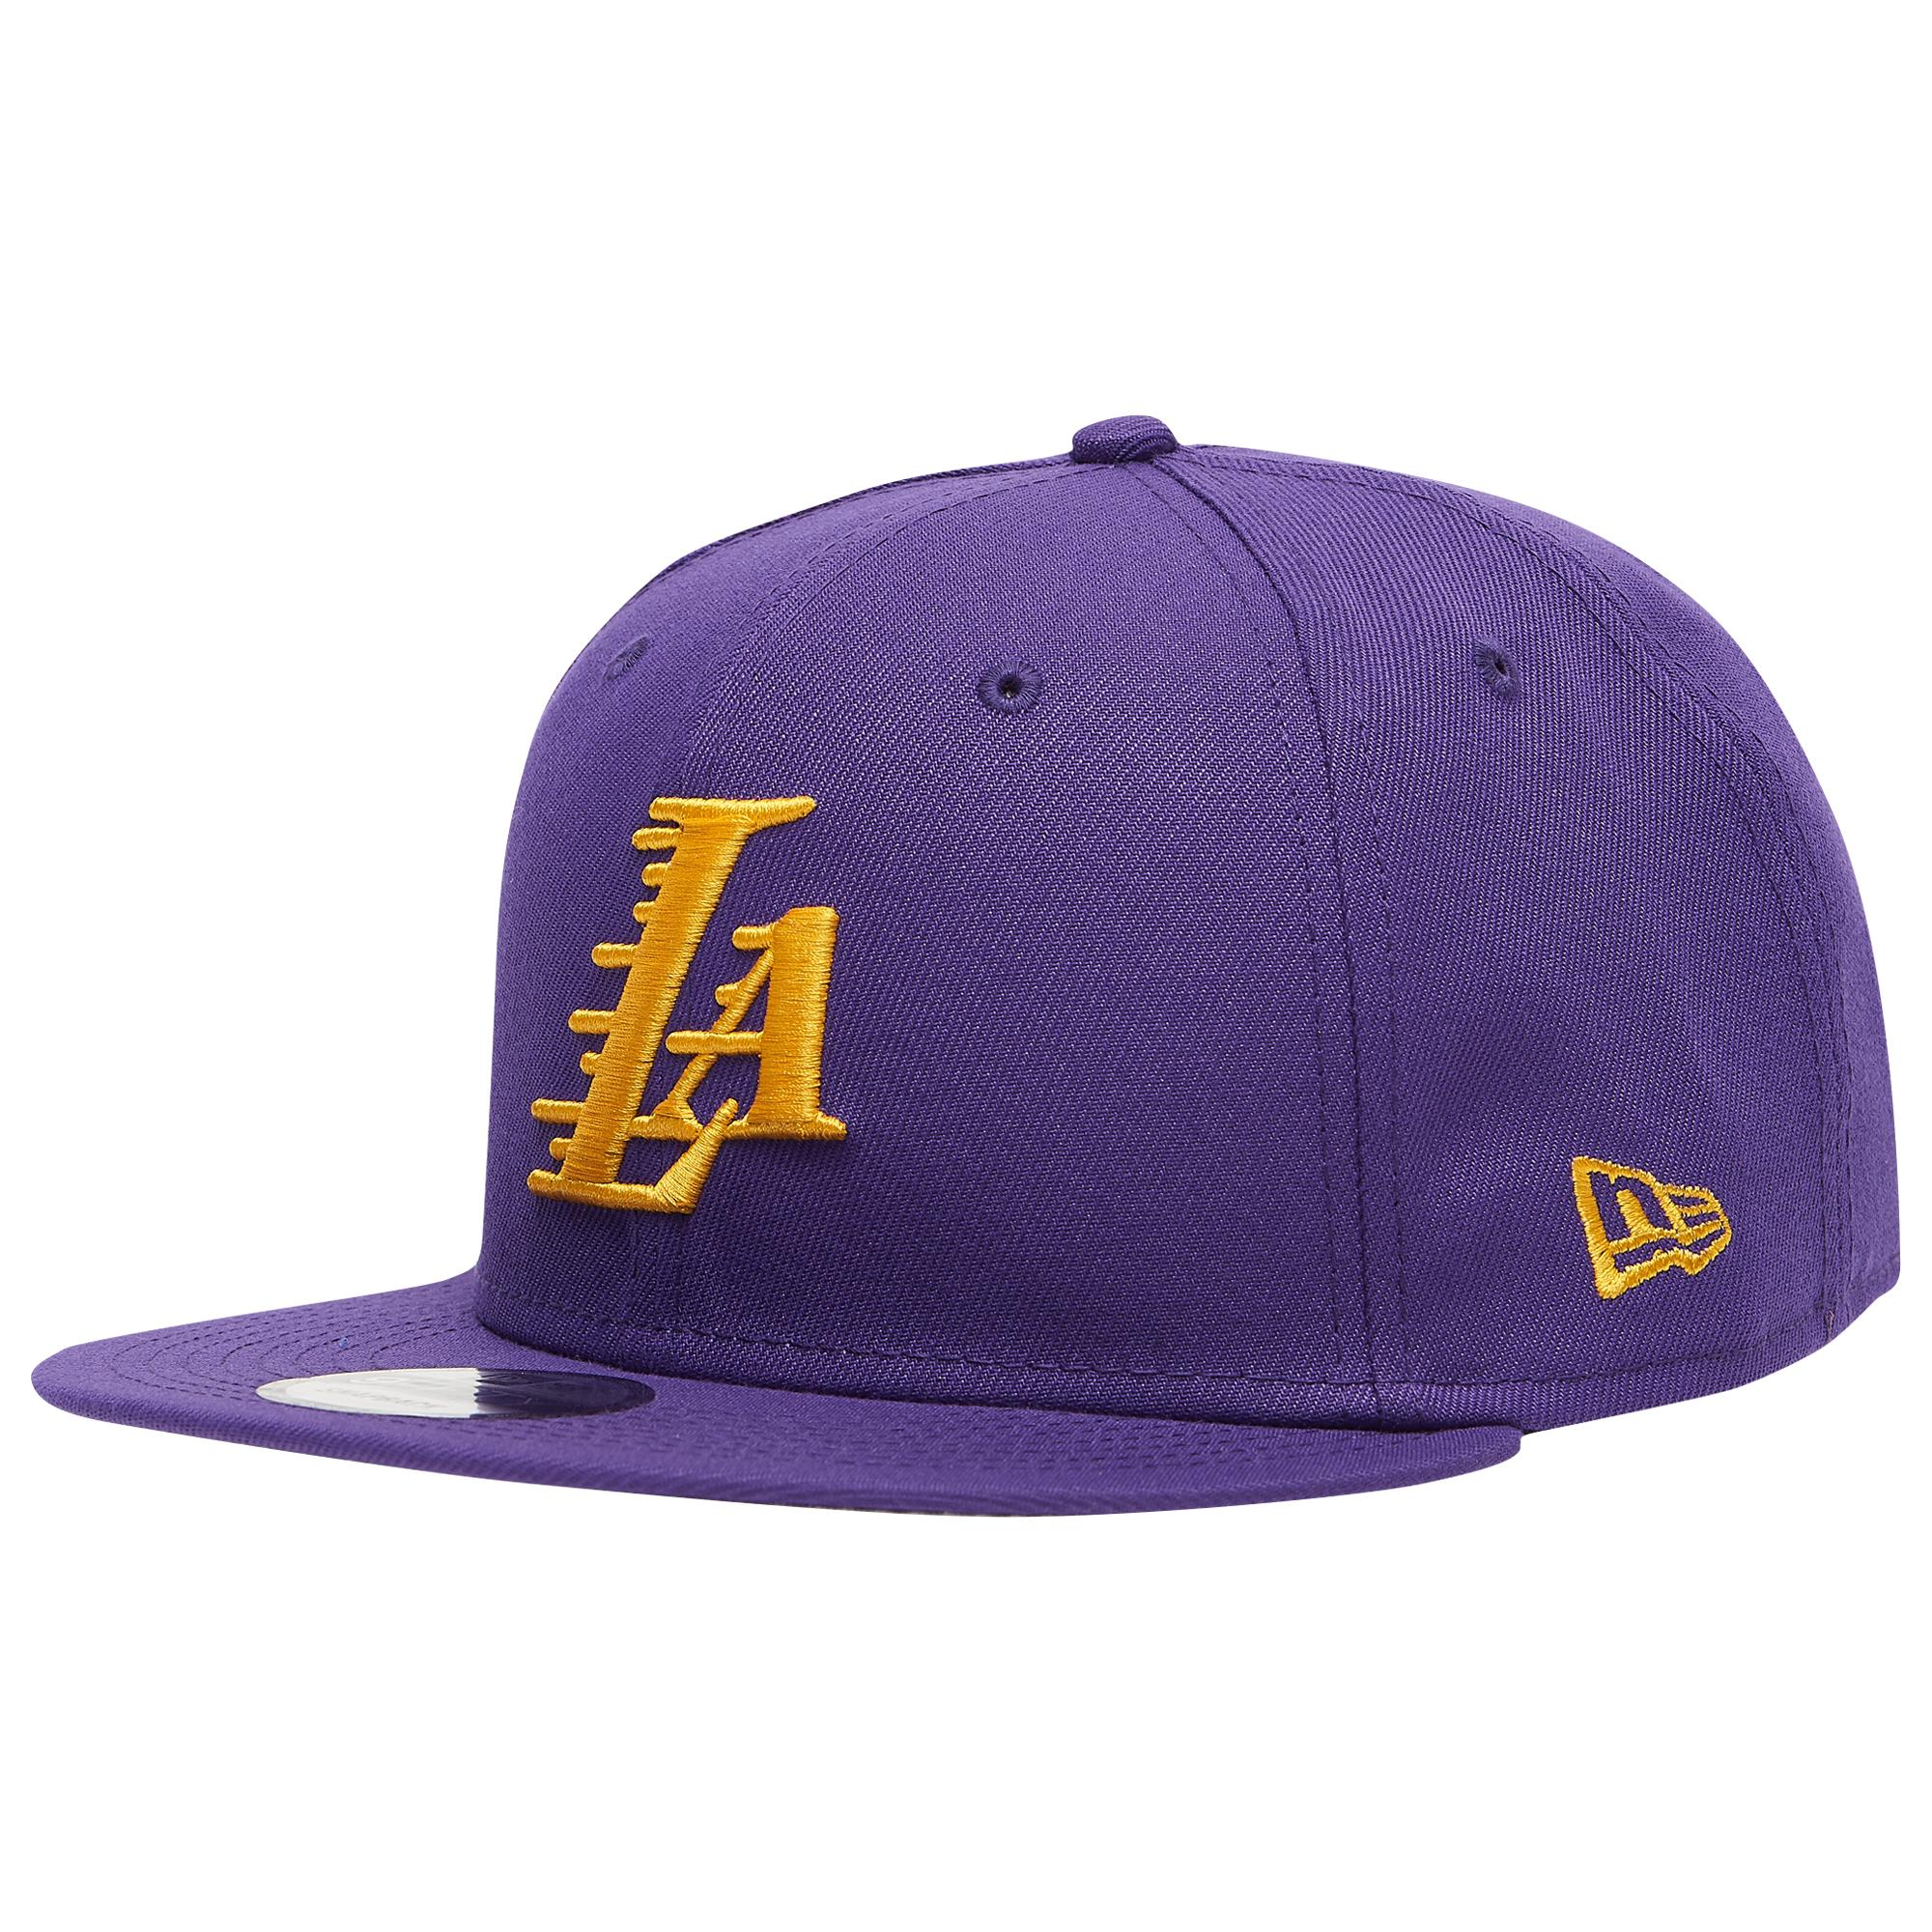 New Era A-Frame Shadow Trucker Cap Los Angeles Dodgers